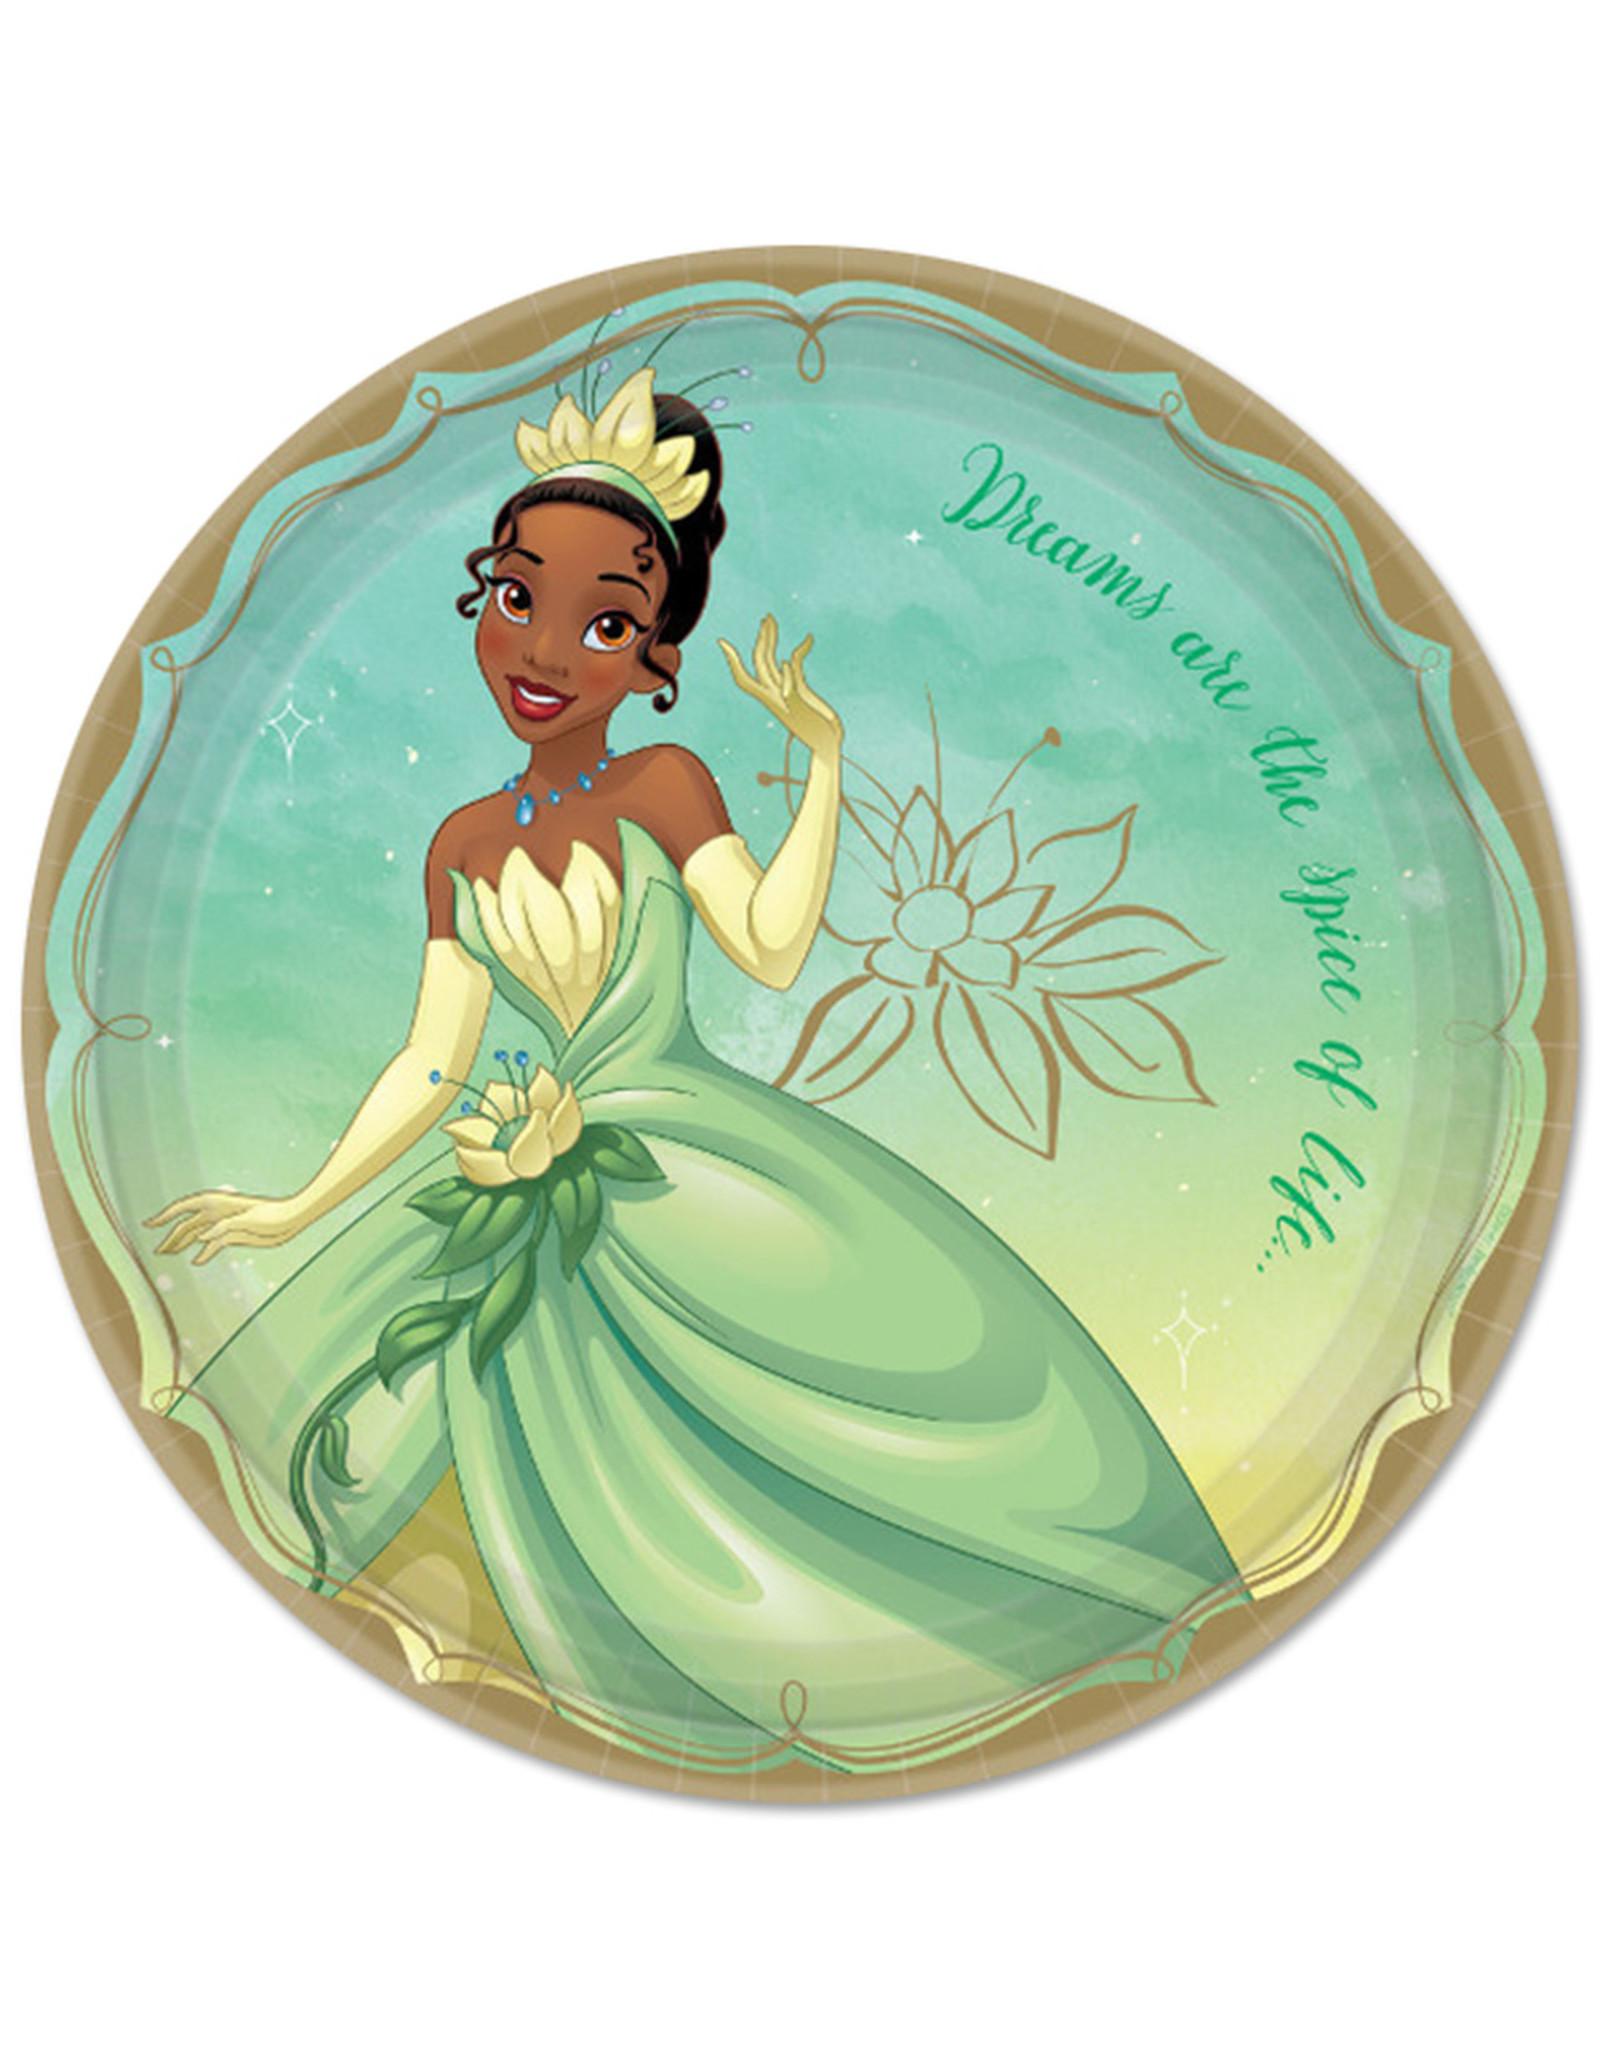 Disney Princess Tiana 9in Plates - 8ct